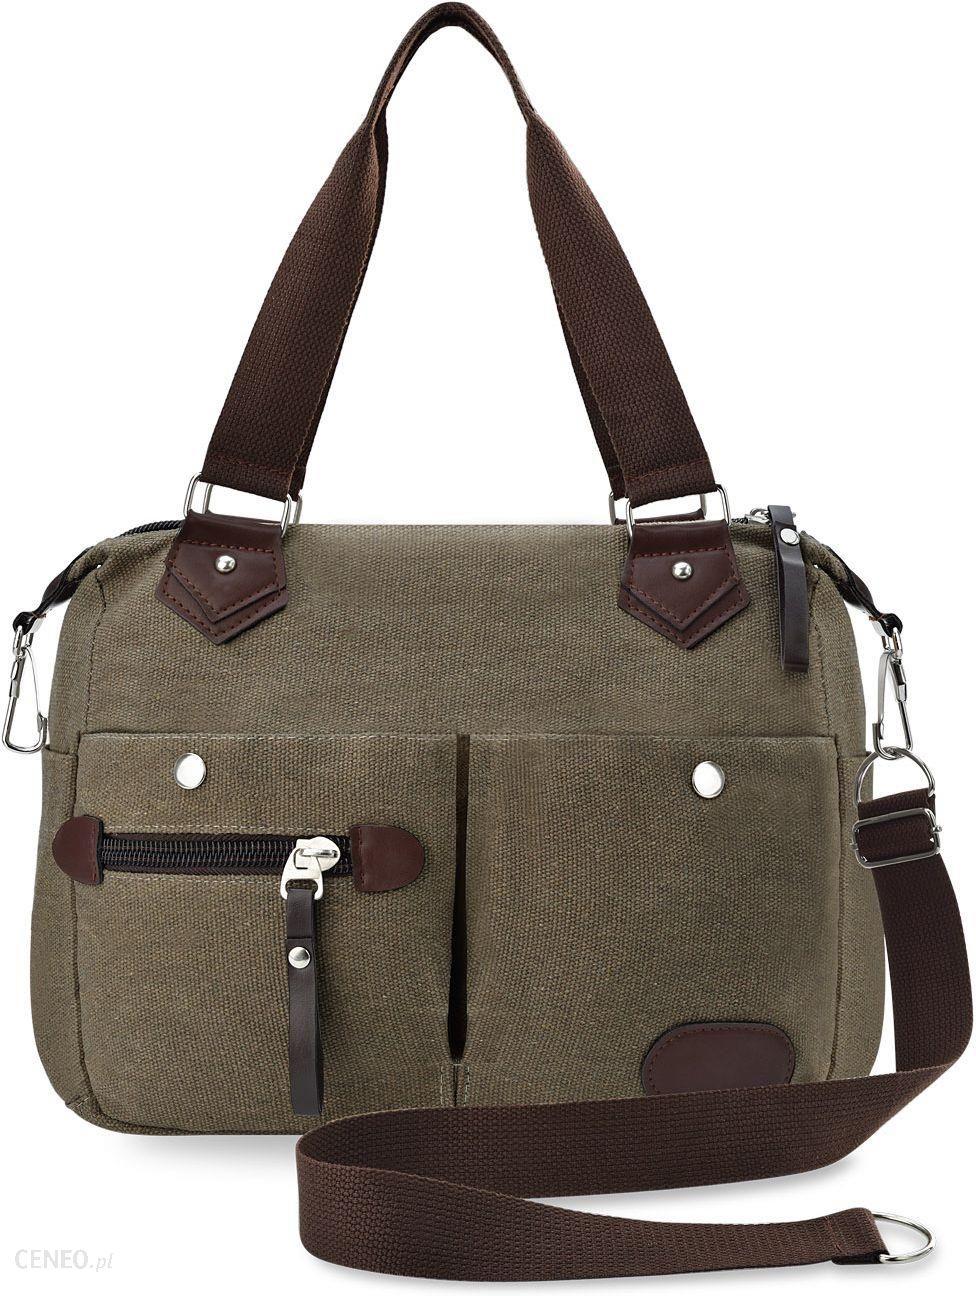 703919d75c567 Solidna lniana torba na ramię płócienna torebka damska luźna shopperka z  kieszonkami - khaki - zdjęcie